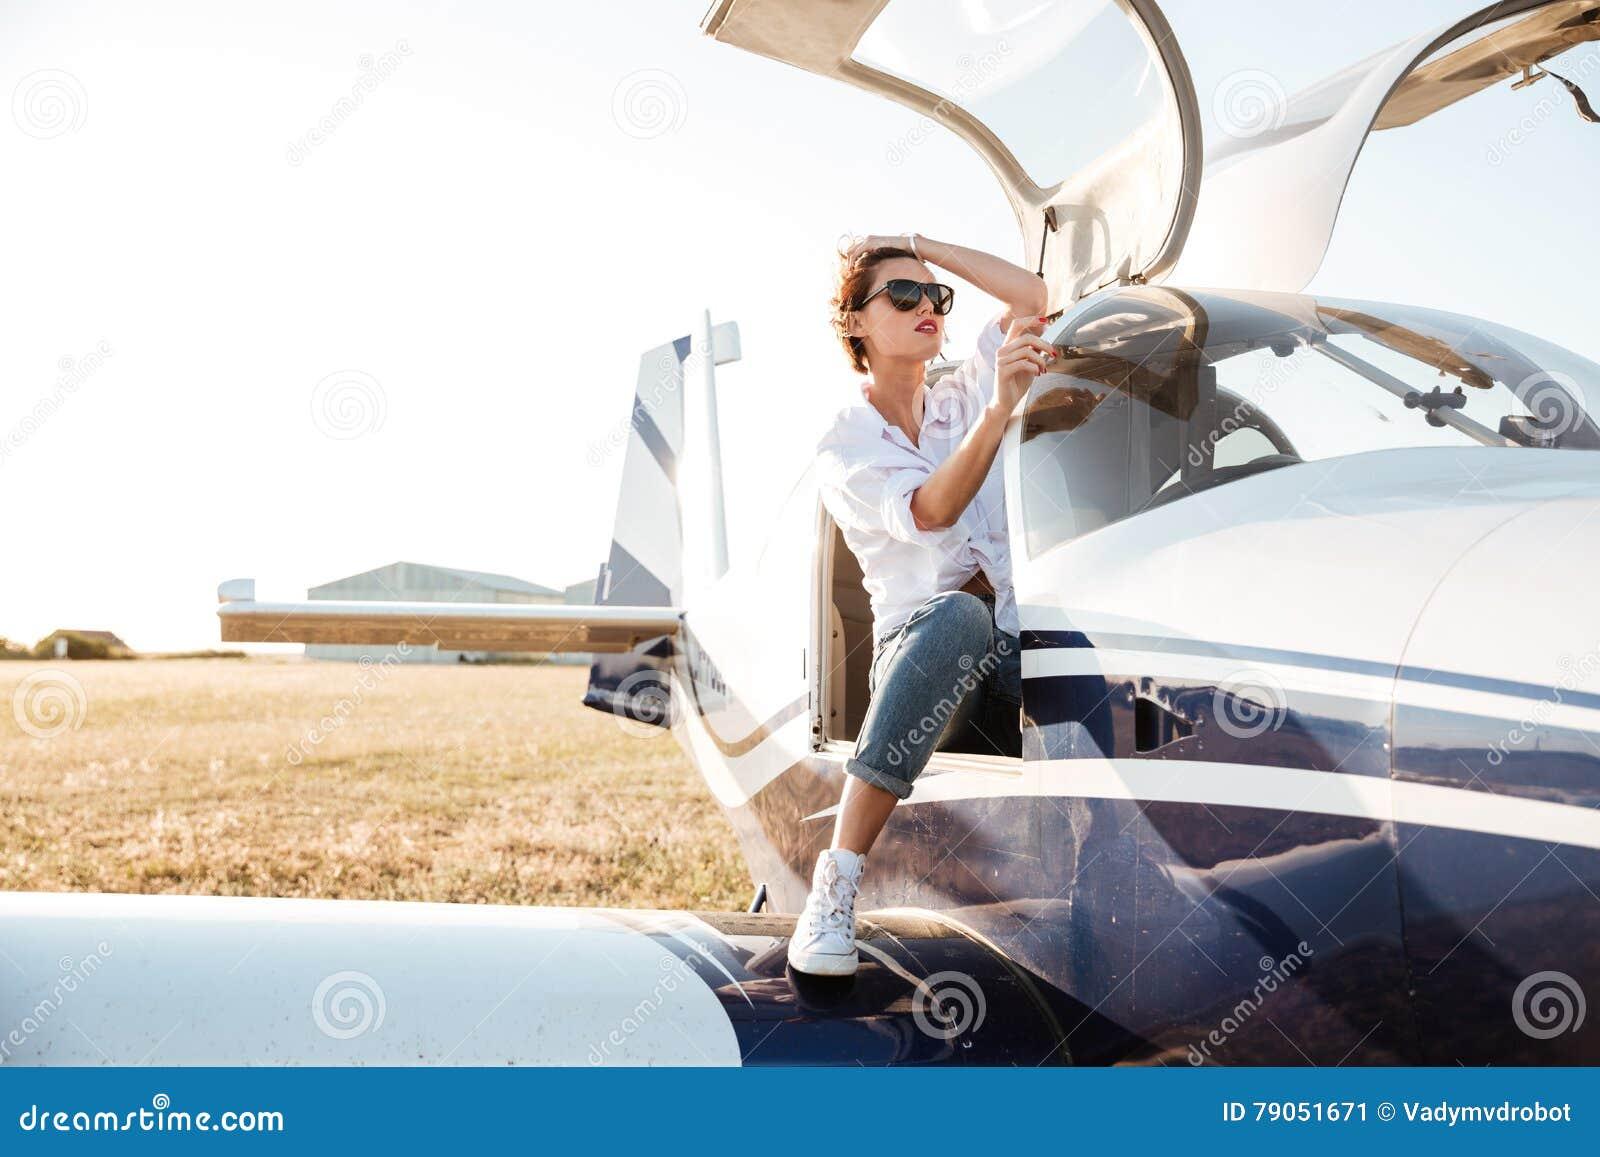 Jet Privato Rosa : Cessna citation business jet immagini cessna citation business